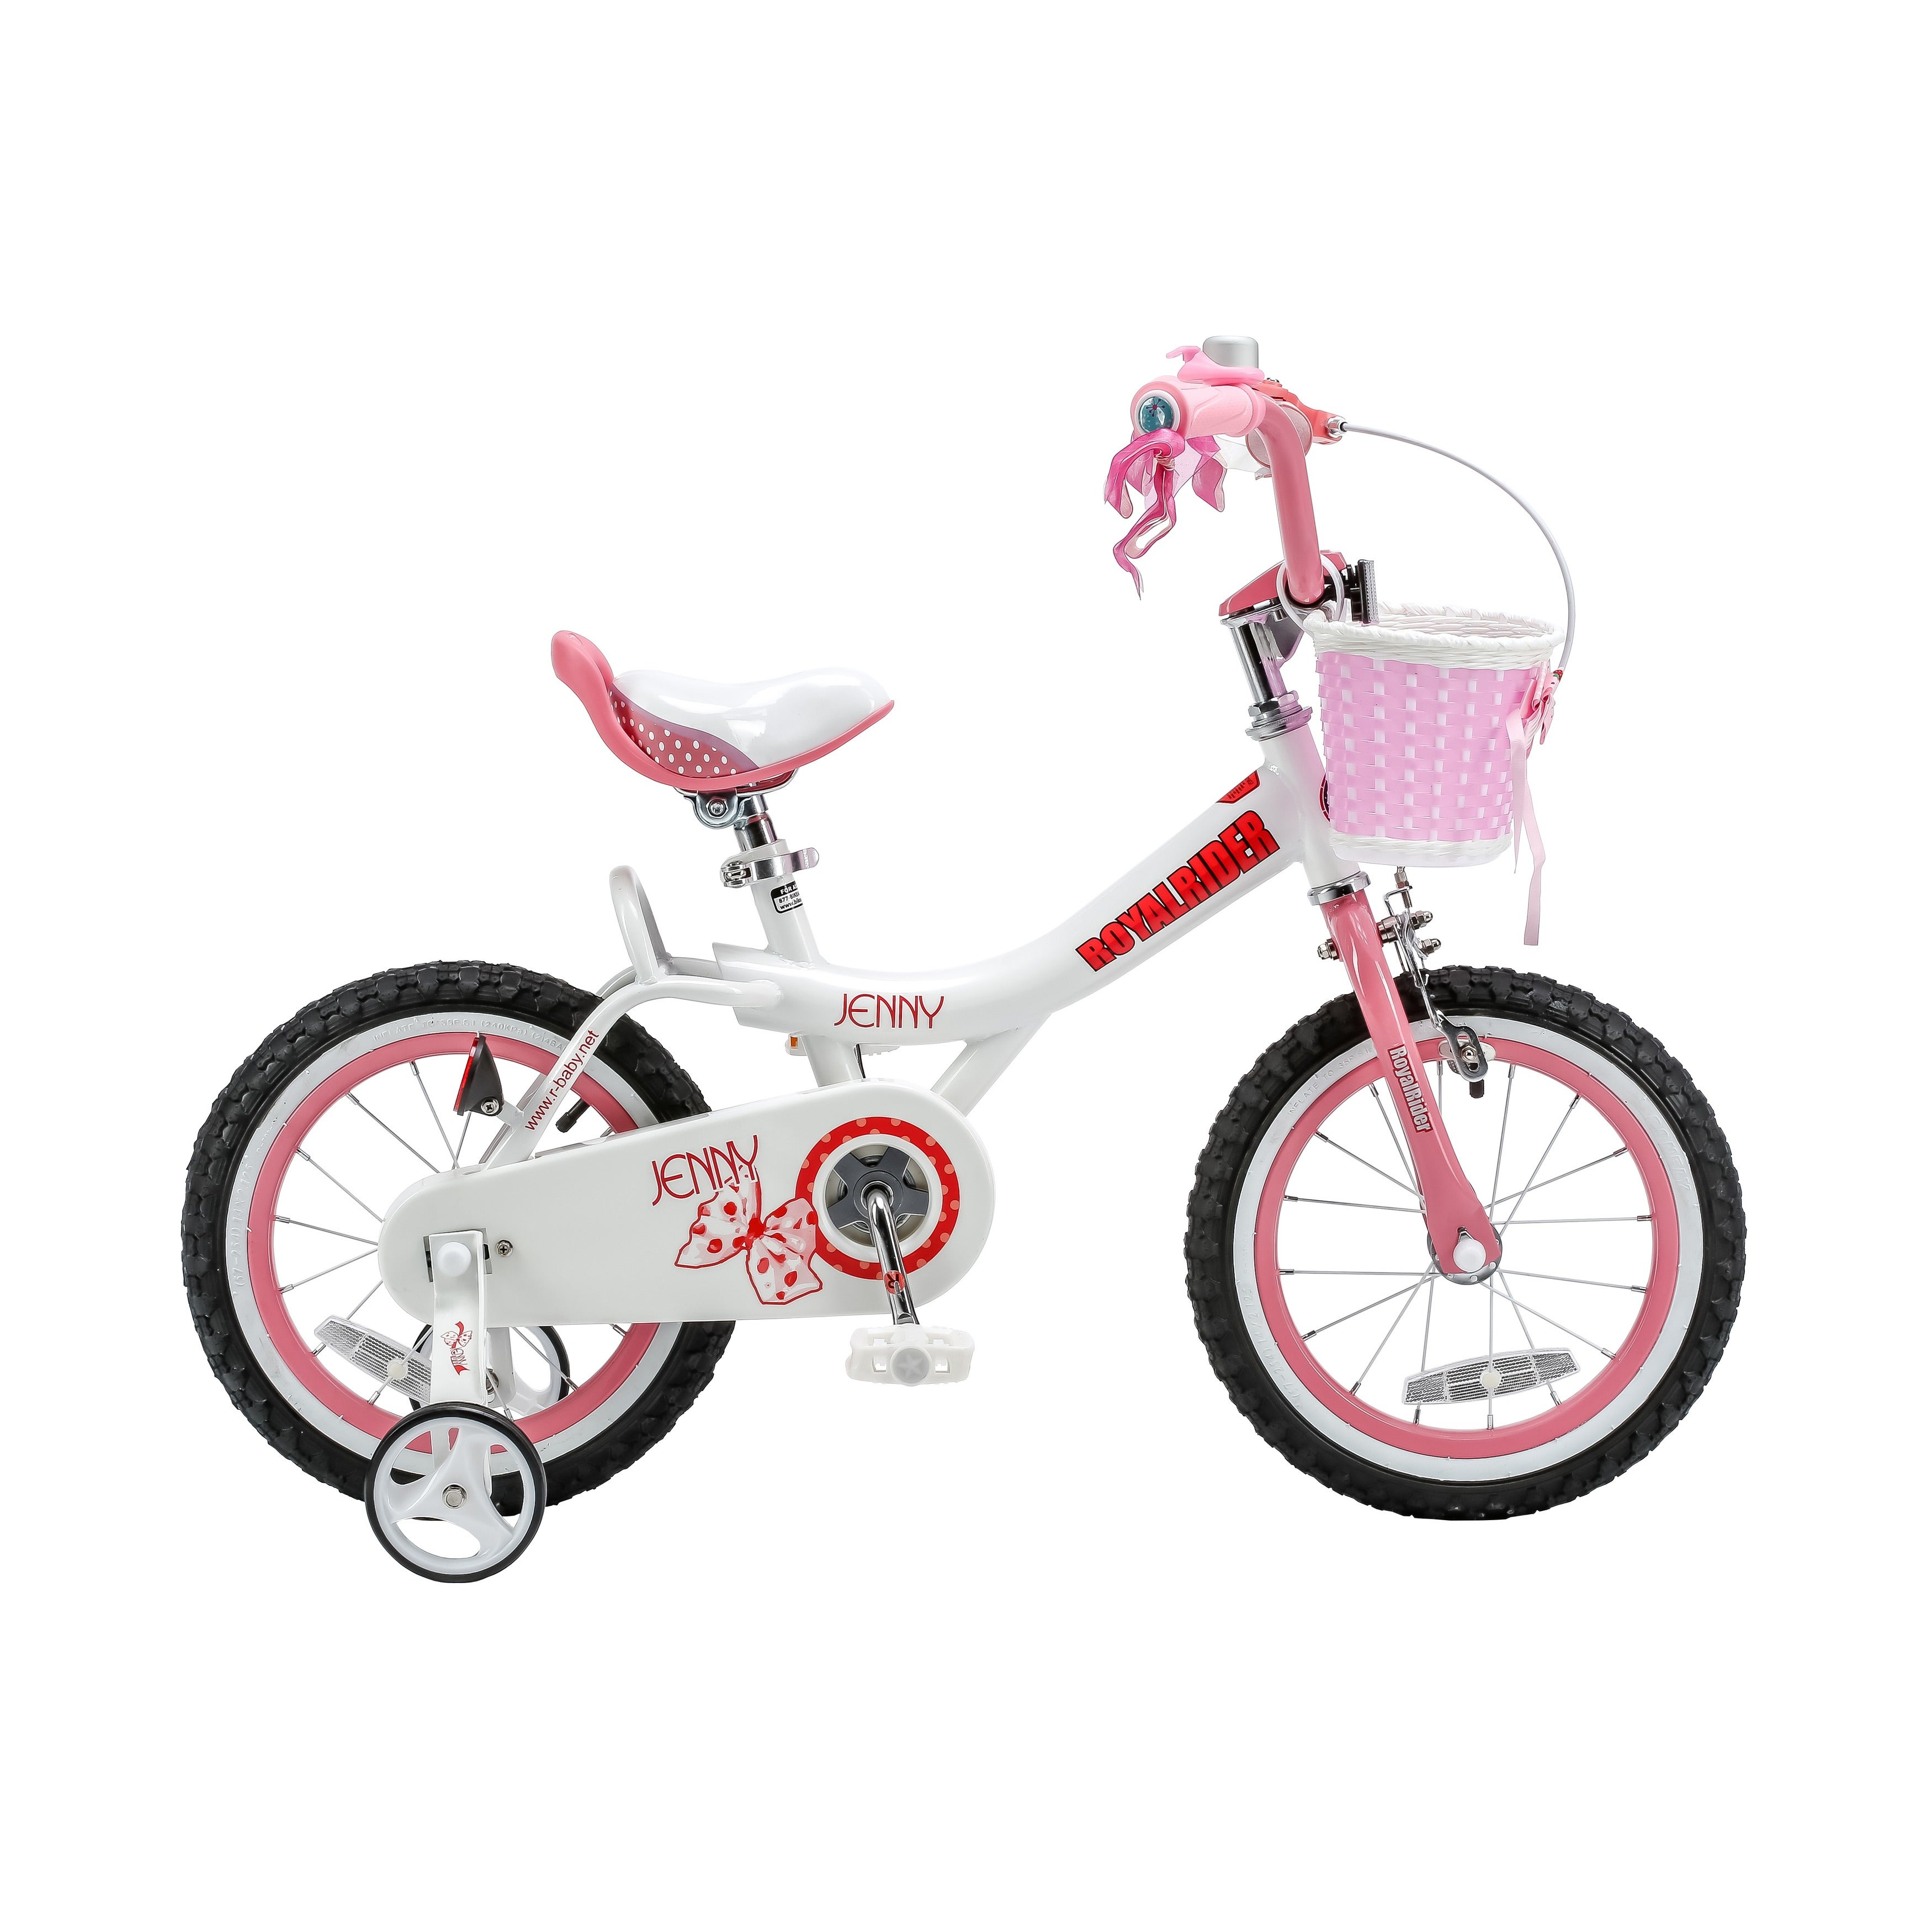 Royalbaby Jenny Princess Pink 12-inch Kids' Bike with Tra...